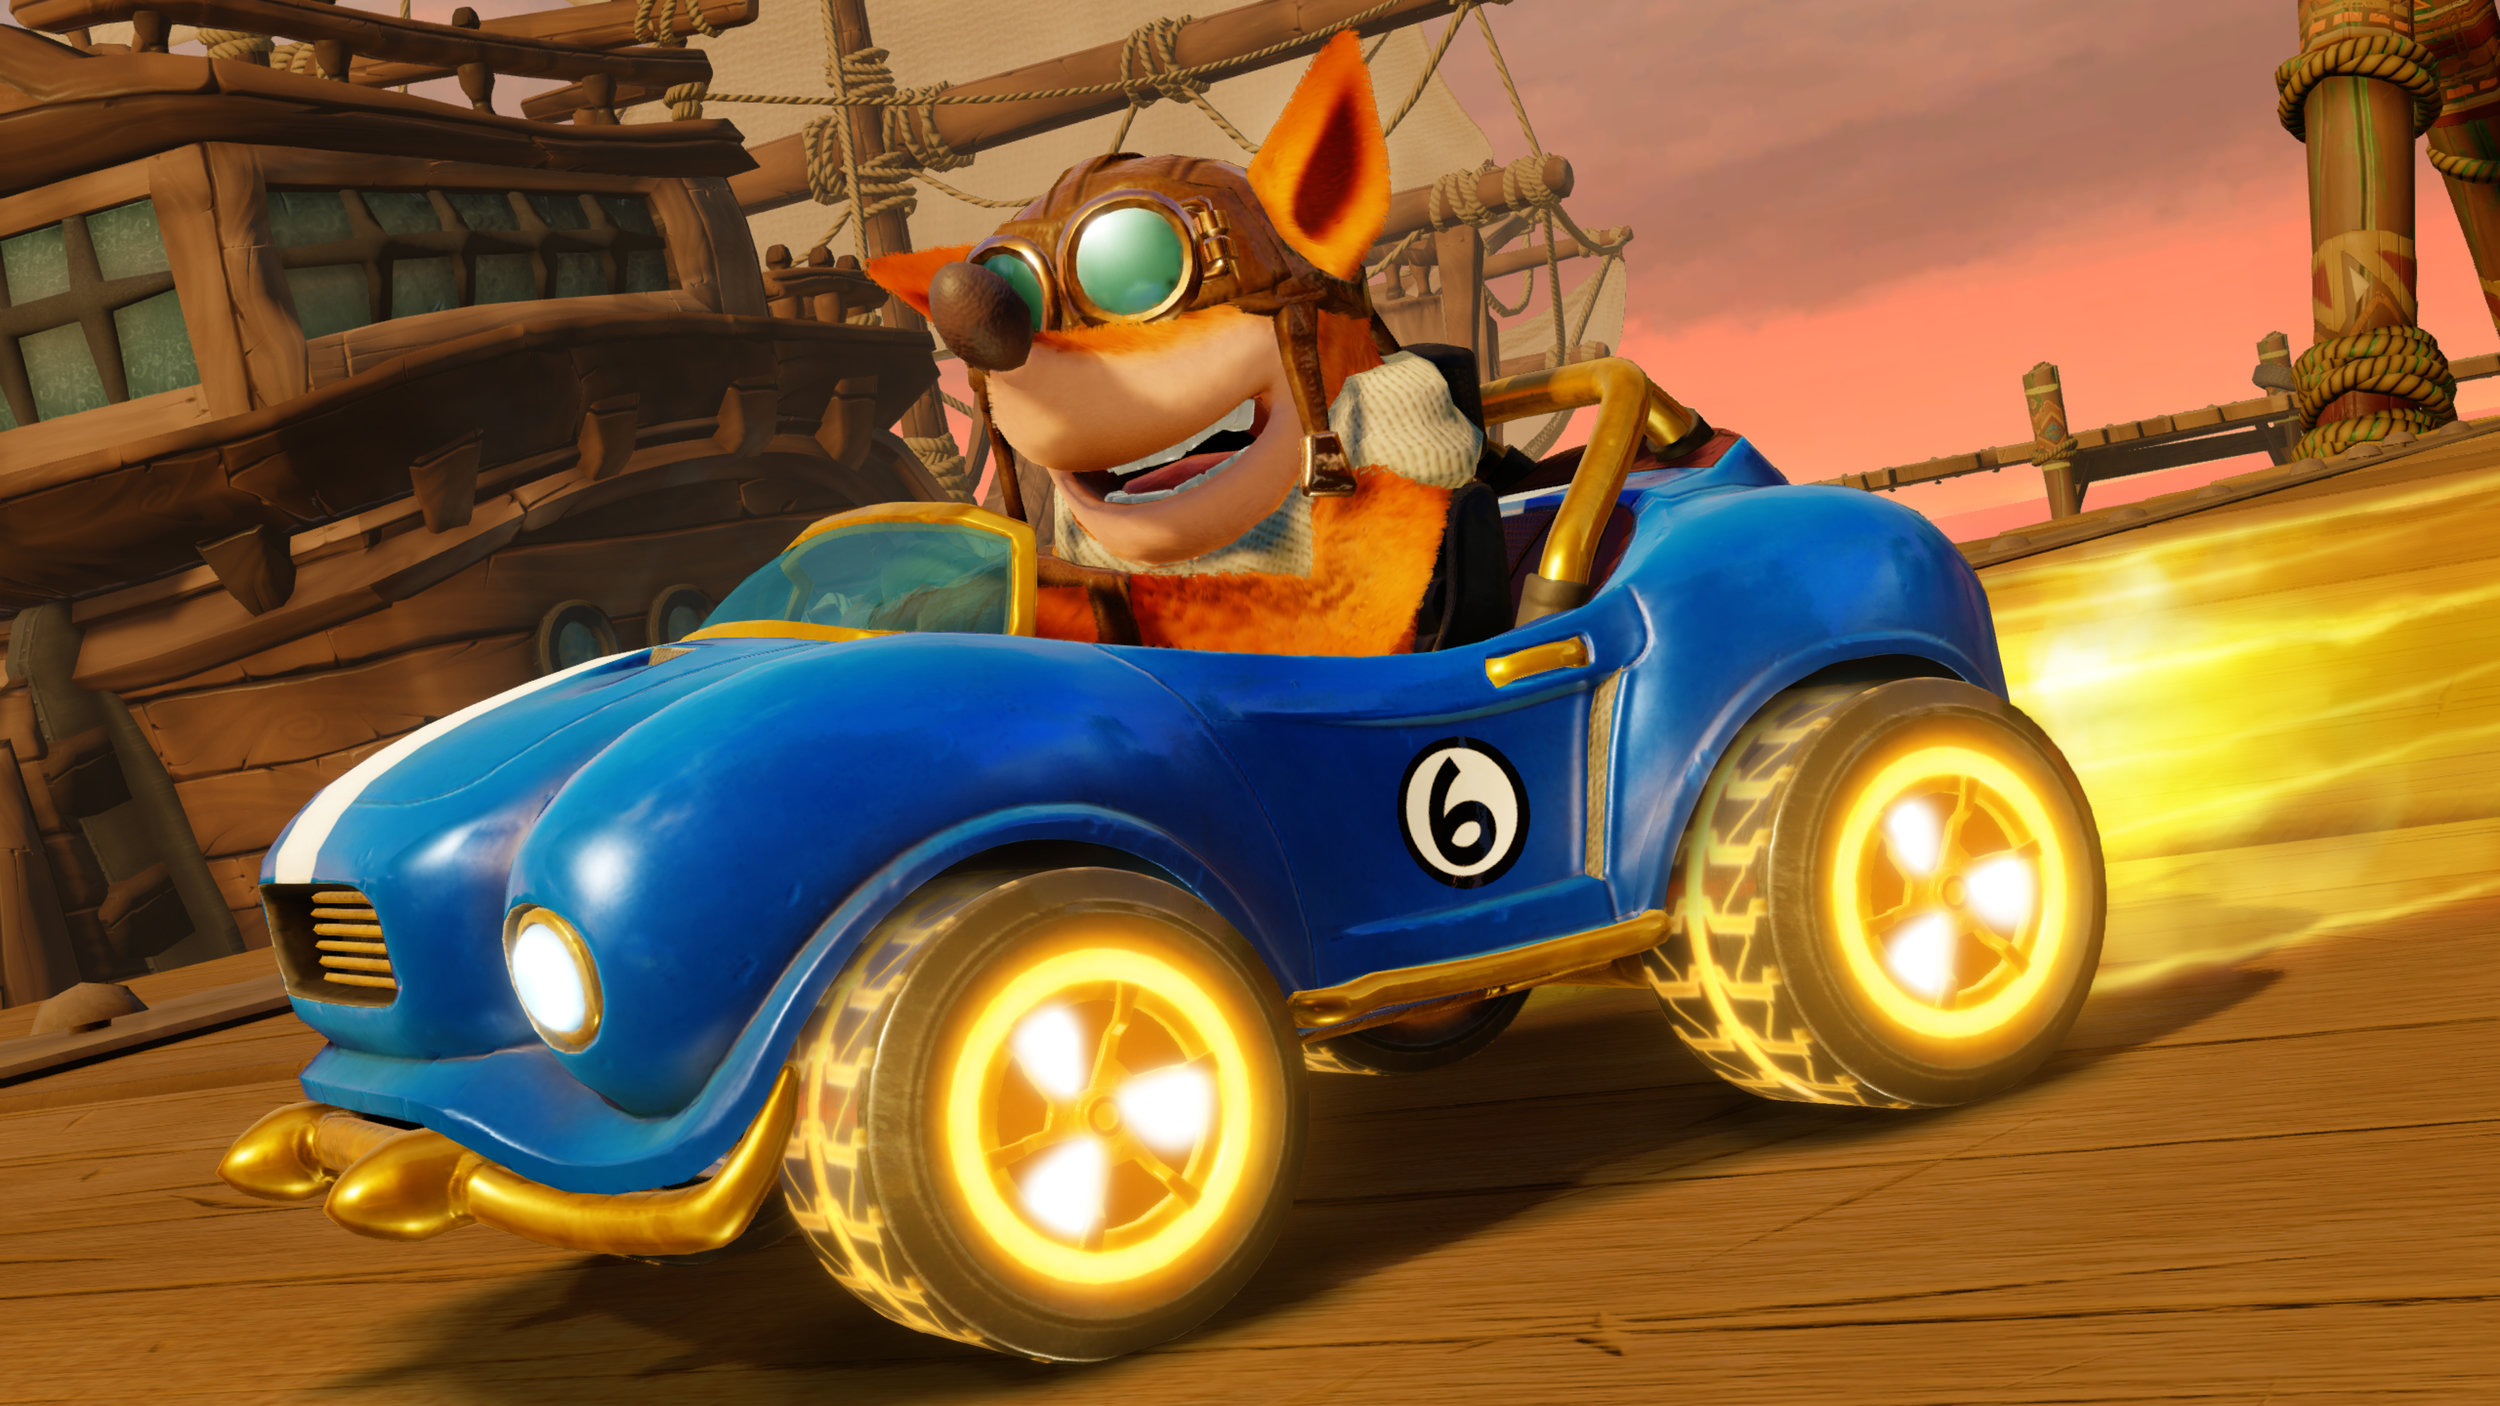 Crash Team Racing Nitro-Fueled Screen 3.jpg